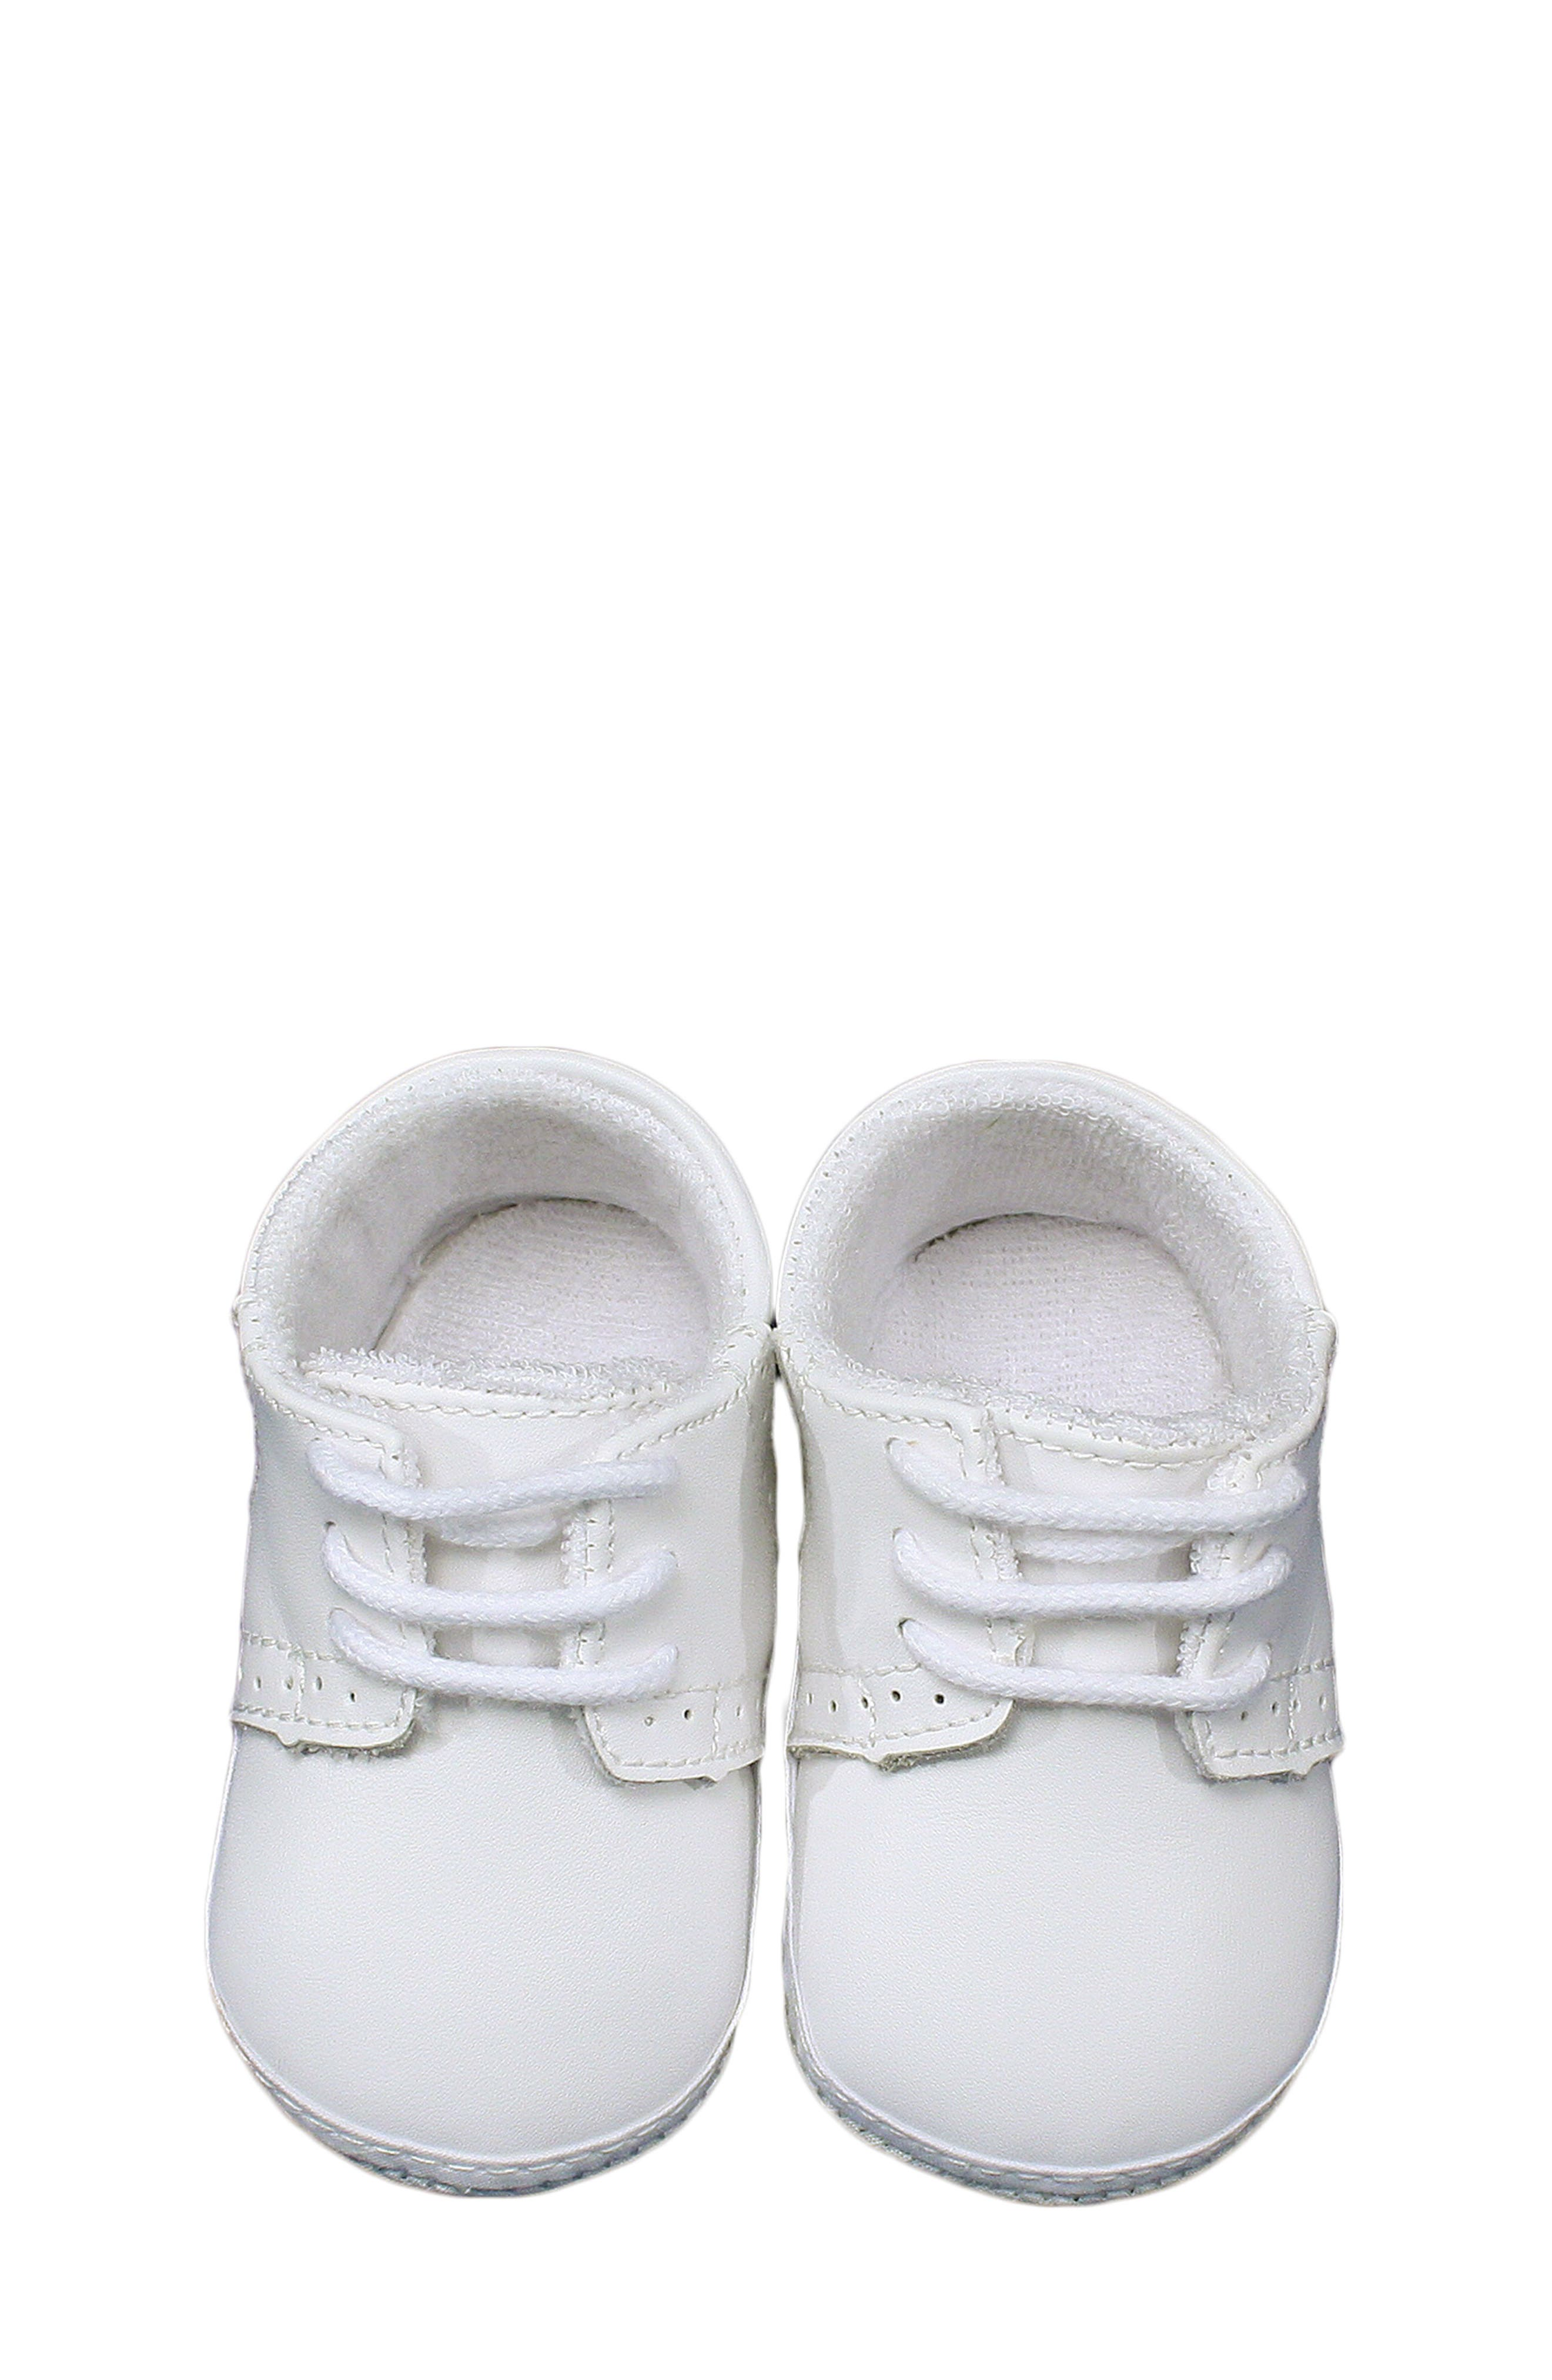 Leather Crib Shoe,                         Main,                         color, White